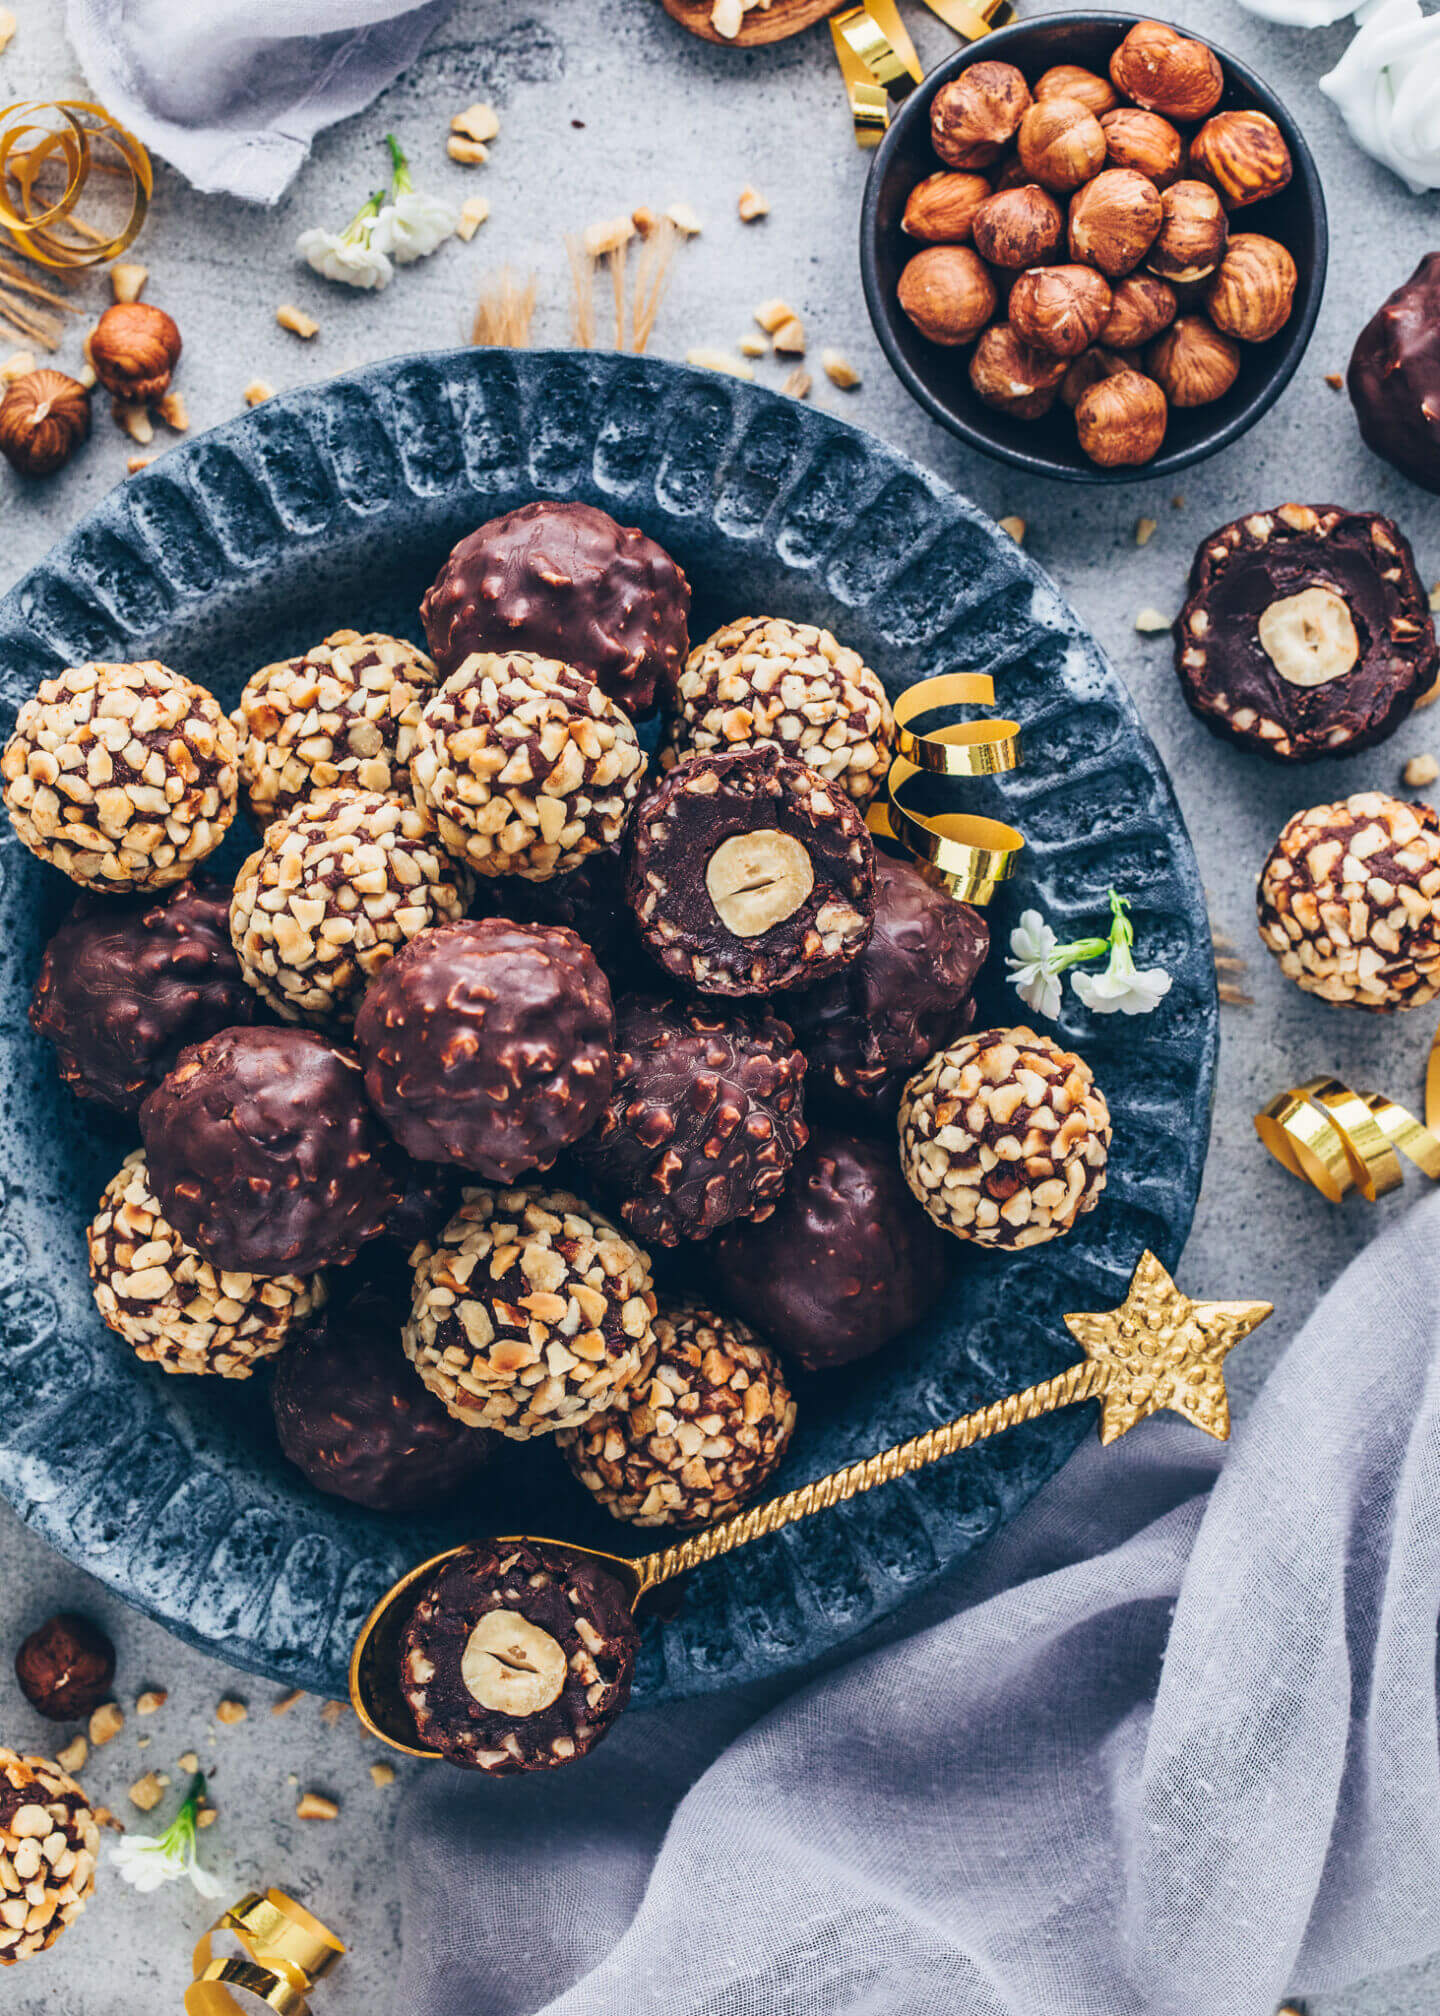 Vegan Ferrero Rocher - Chocolate Hazelnut Balls